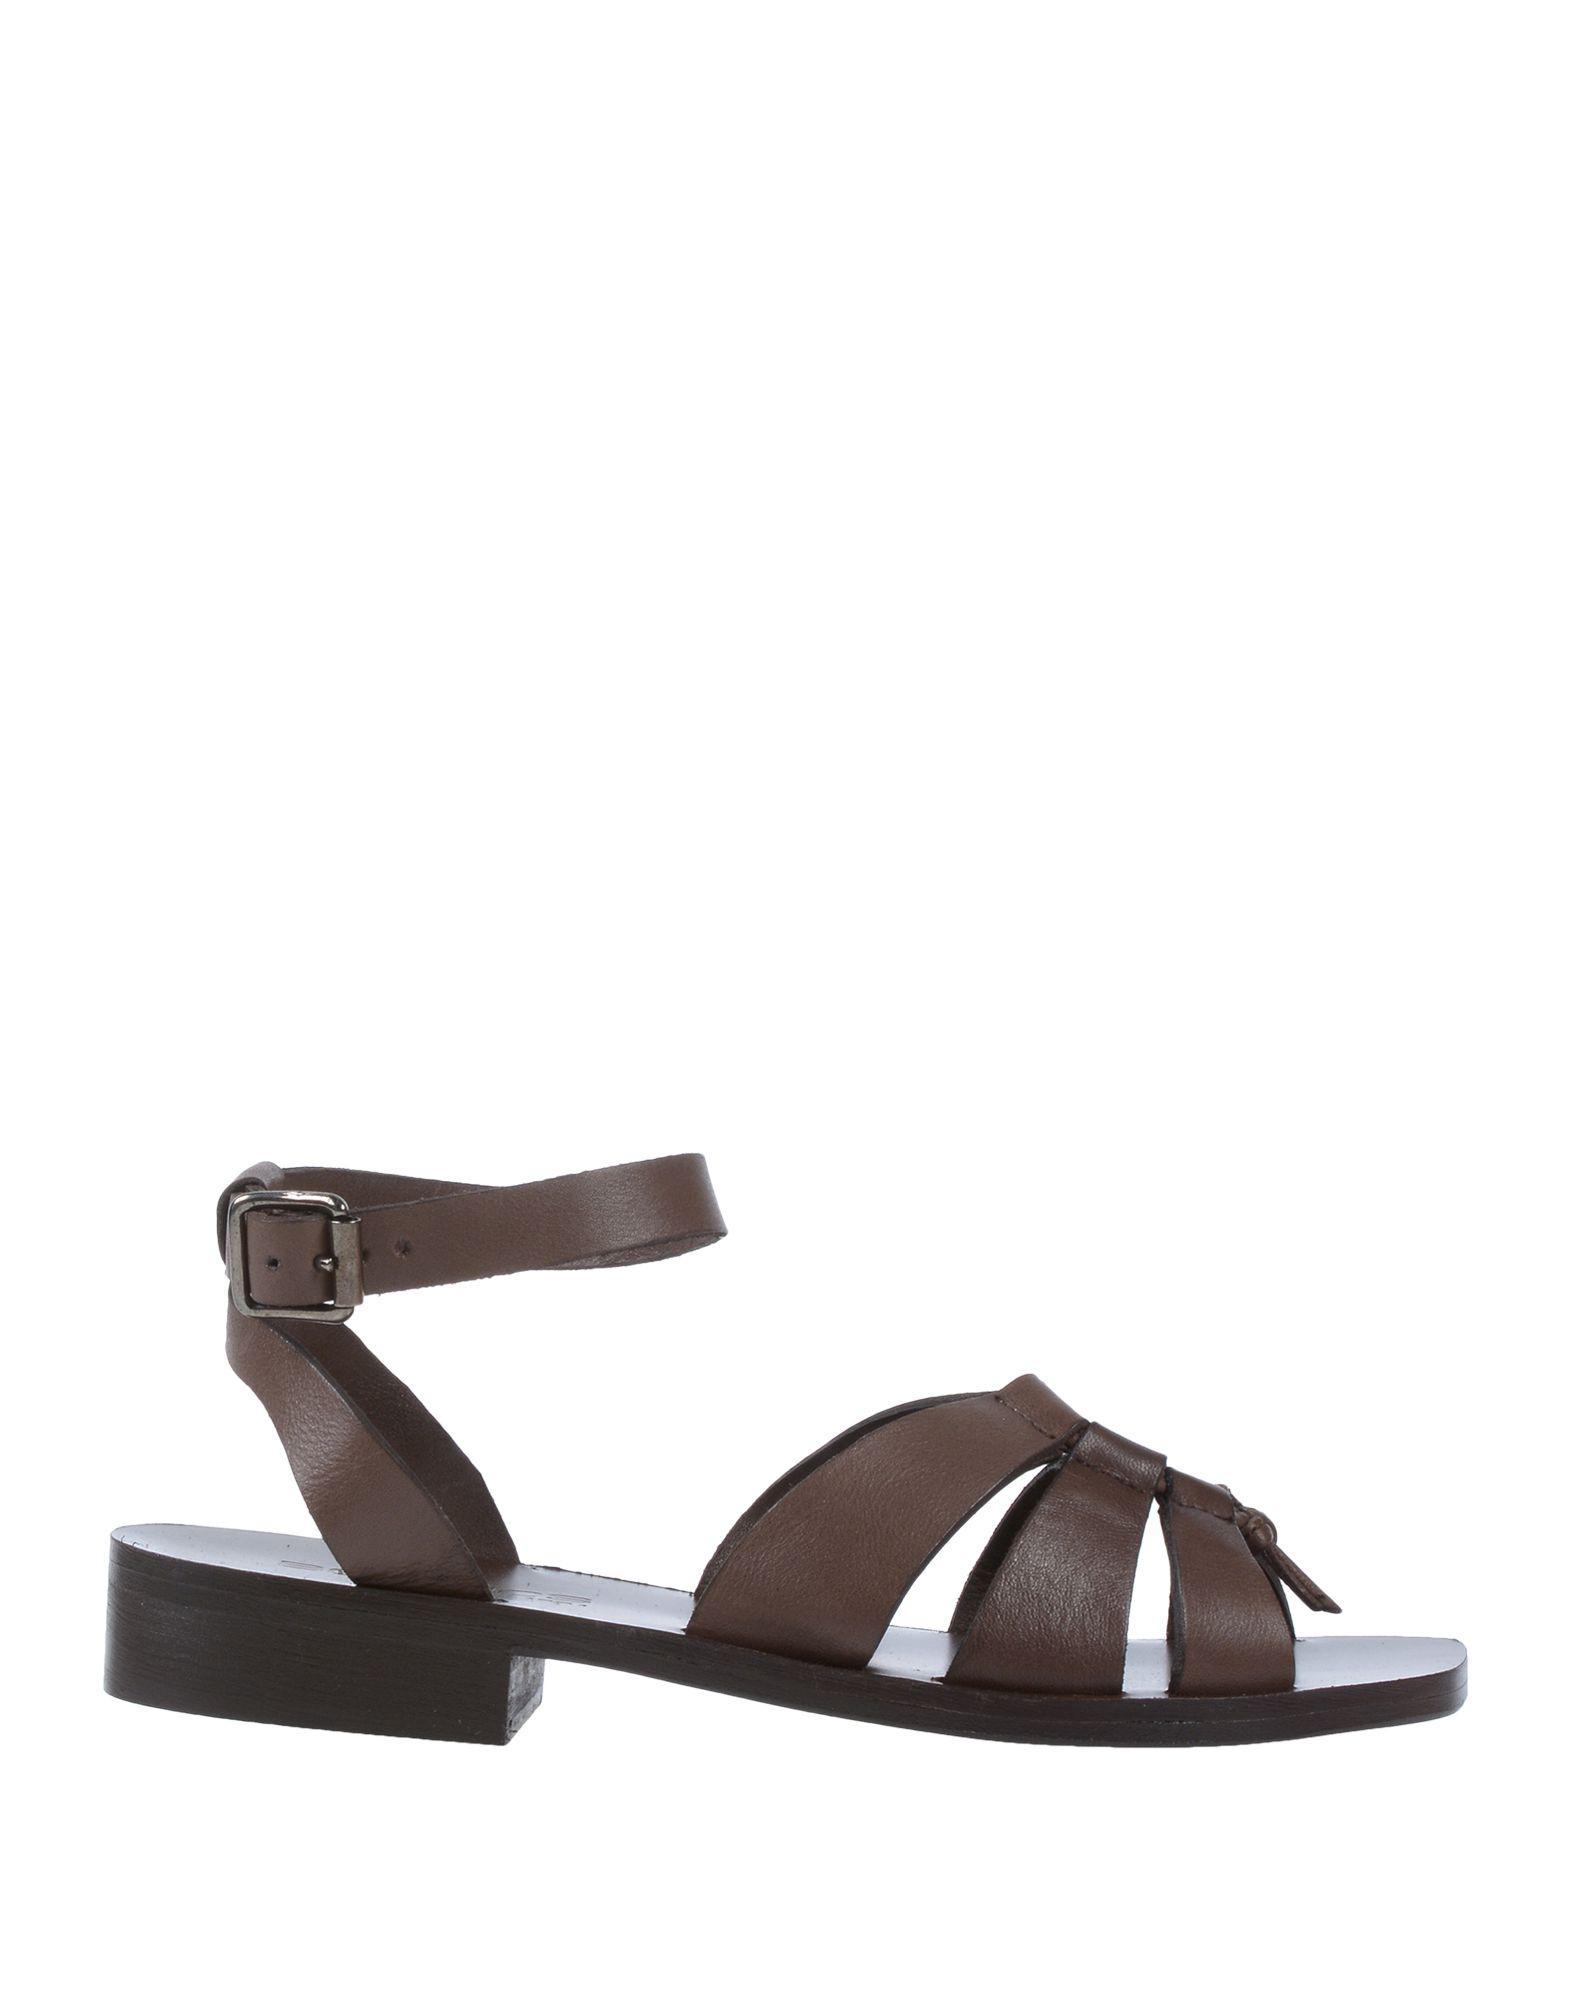 687674ab7a96 Boemos Sandals in Brown - Lyst